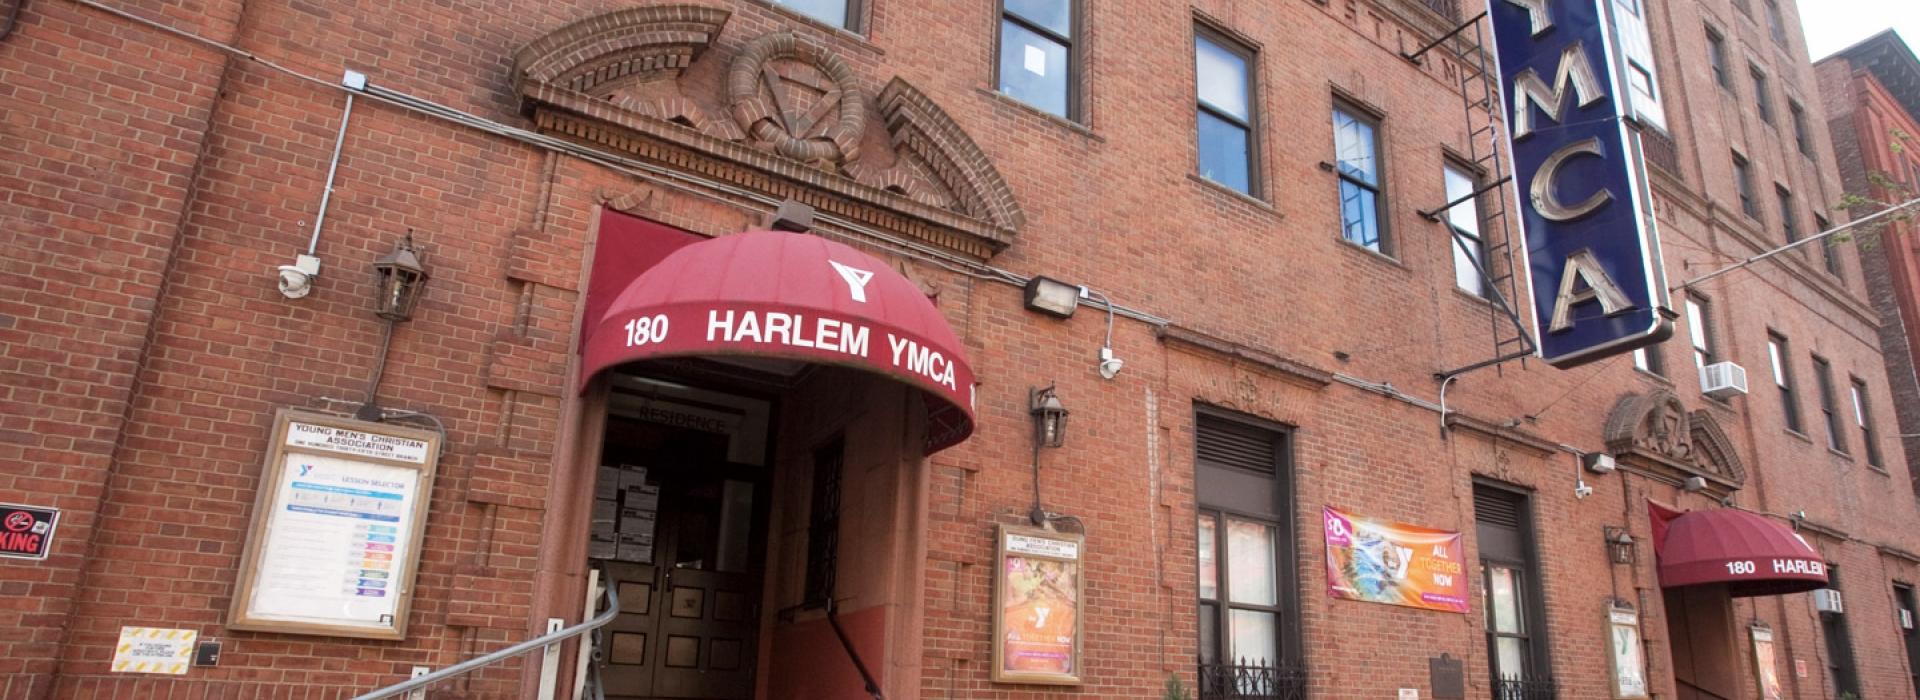 About harlem ymca new york city 39 s ymca - 600 exterior street bronx ny 10451 ...